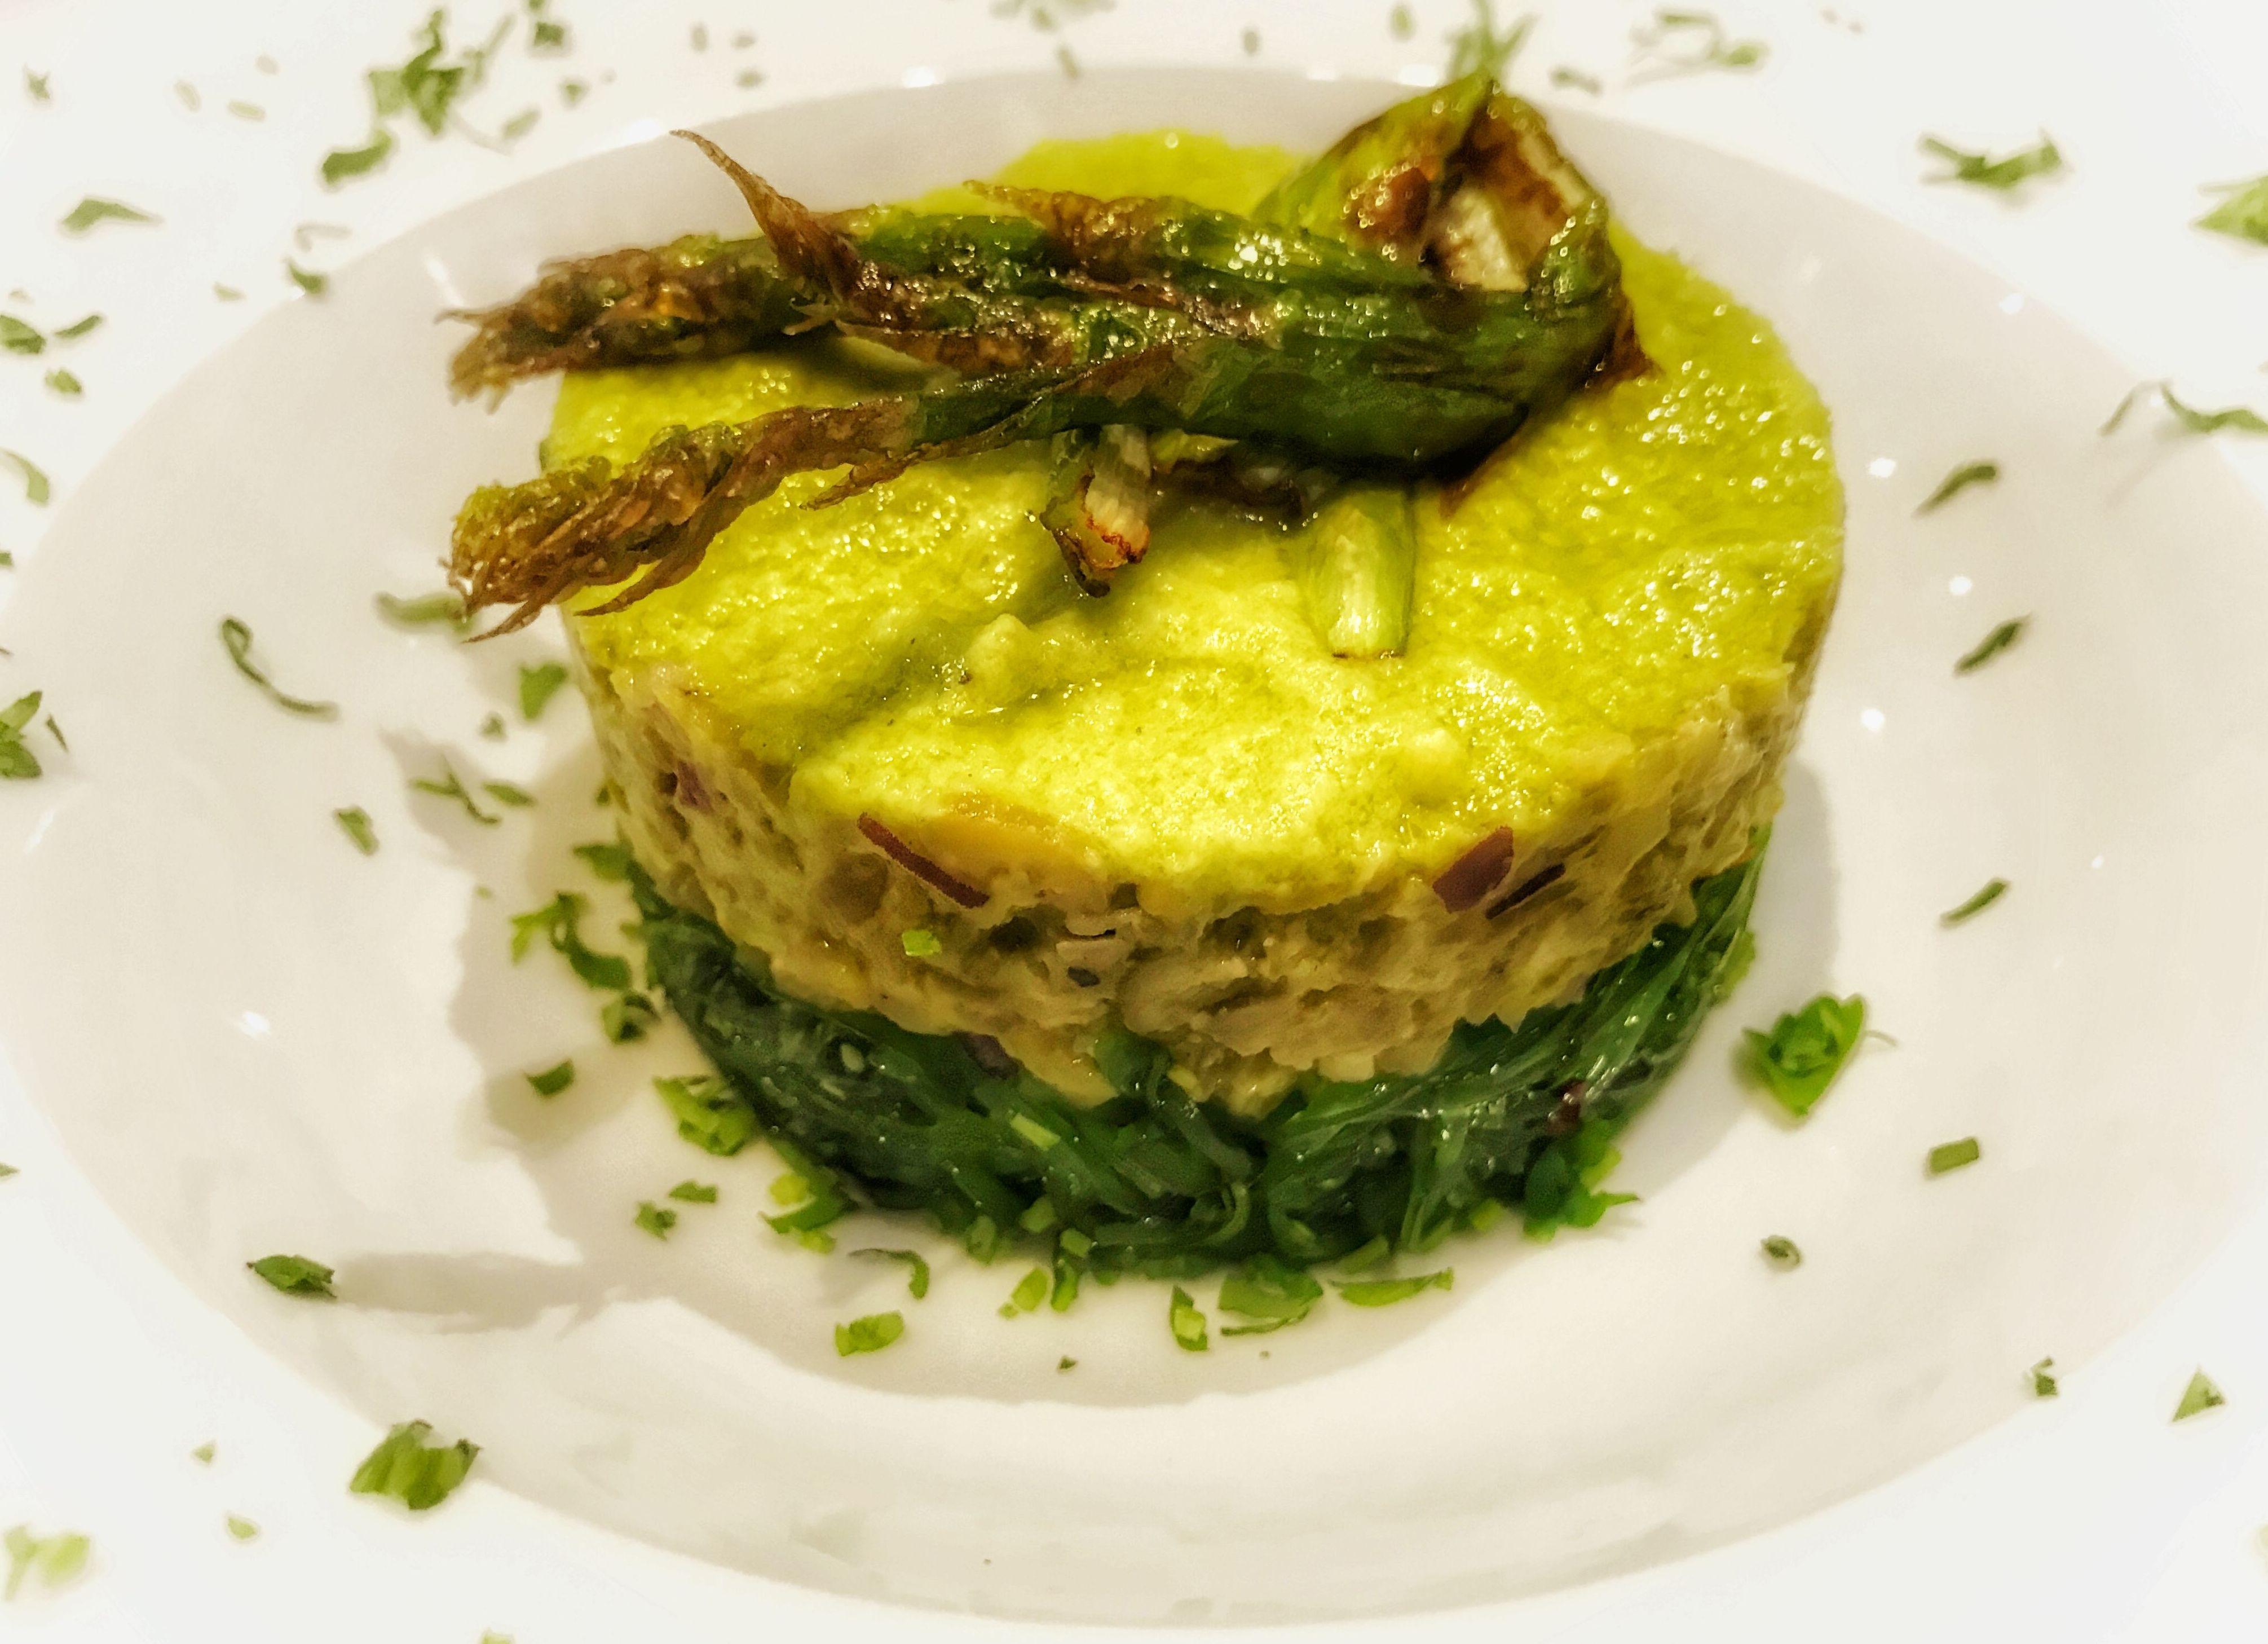 Foto 4 de Restaurante en Málaga | Ocho